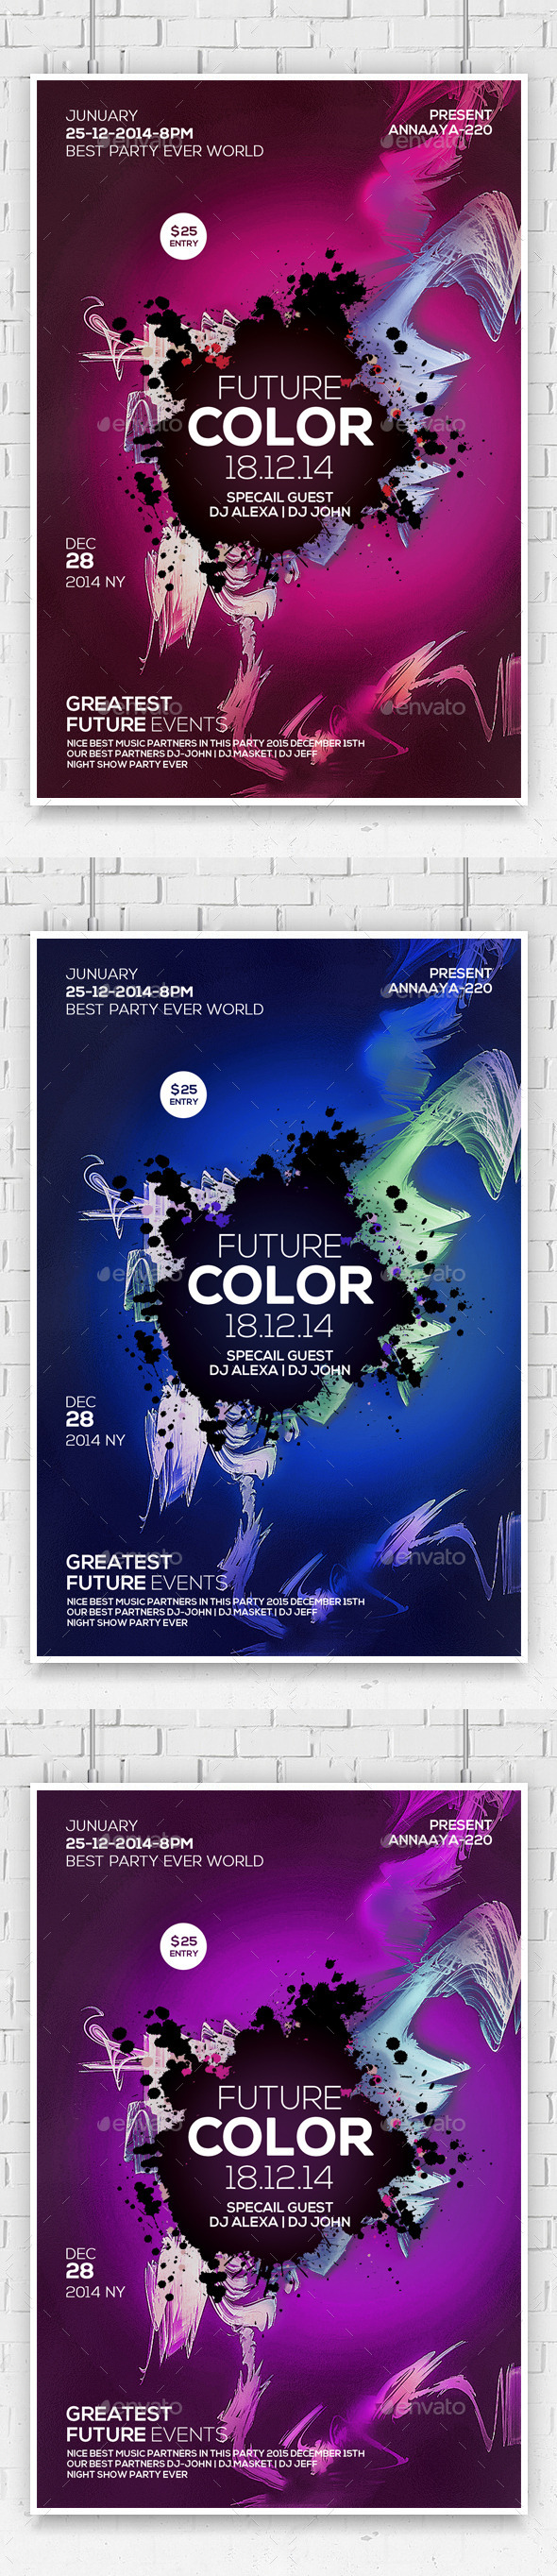 GraphicRiver Future Trap City Beatz Party Flyer 10487920